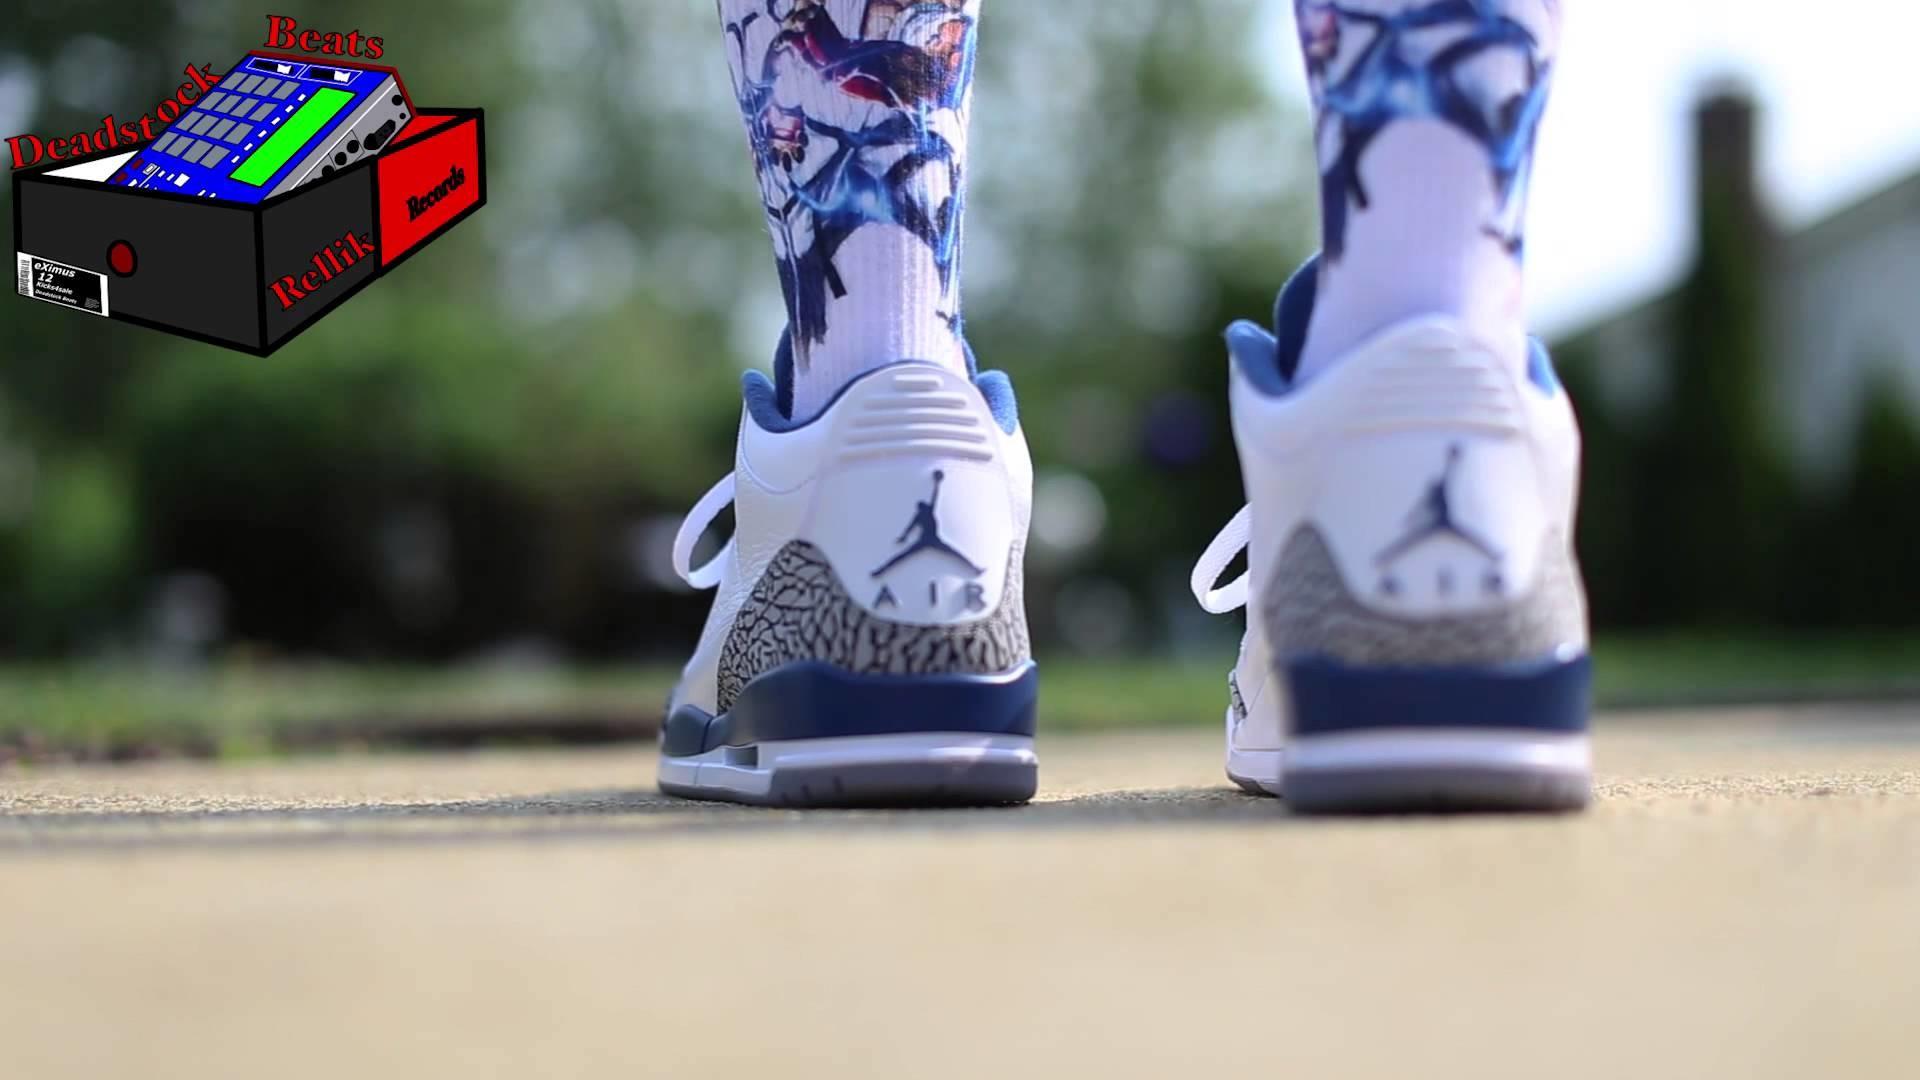 Jordan Shoes Wallpaper Pc - Jordan 55